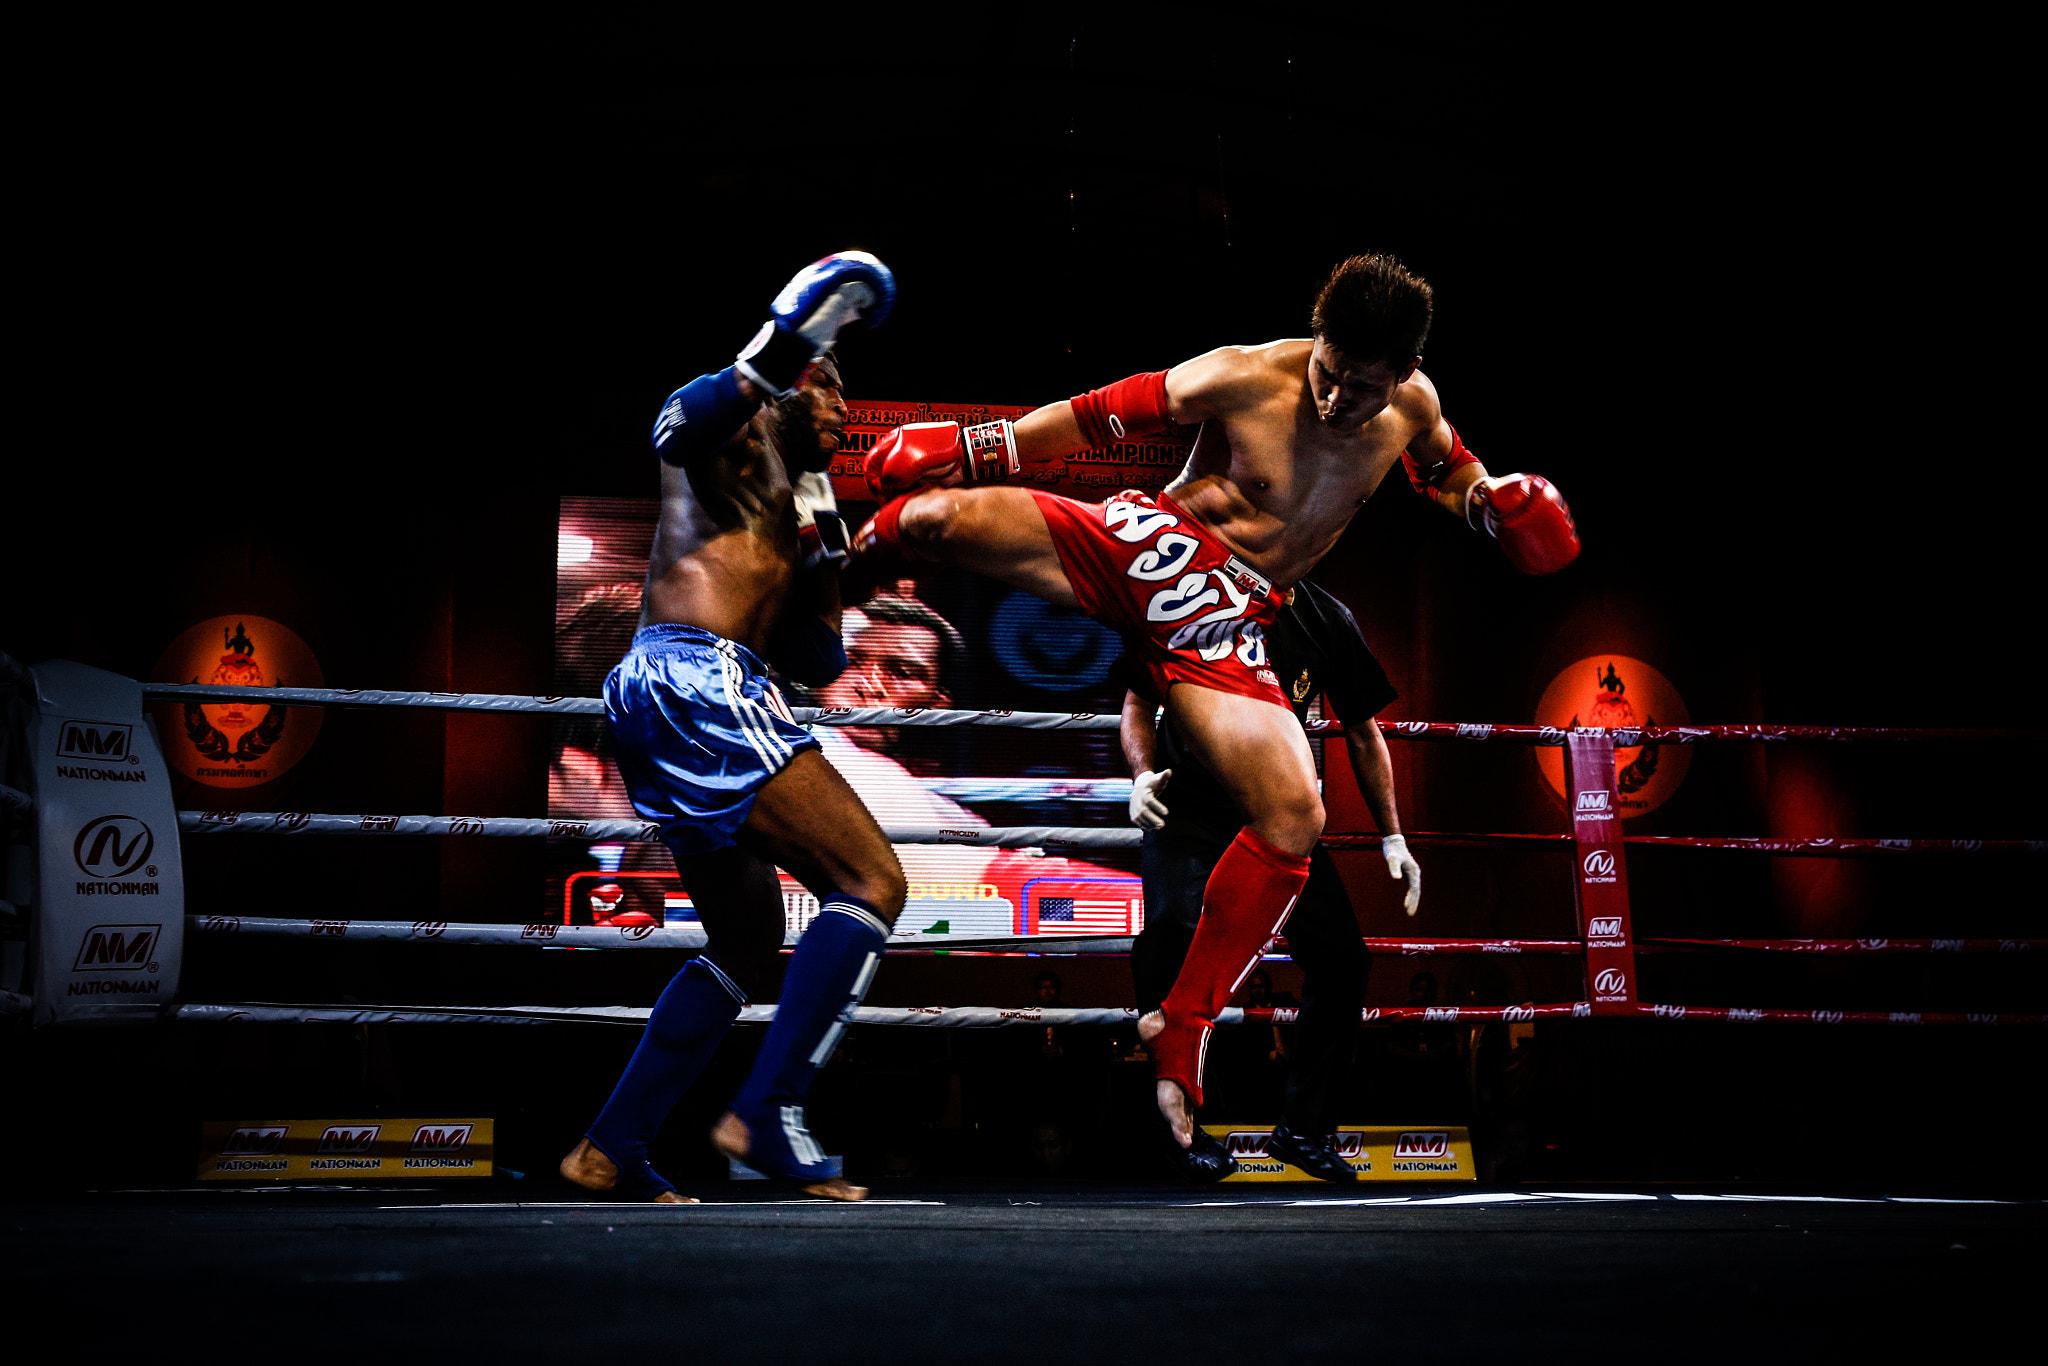 Muay Thai Fight: US vs. Burma